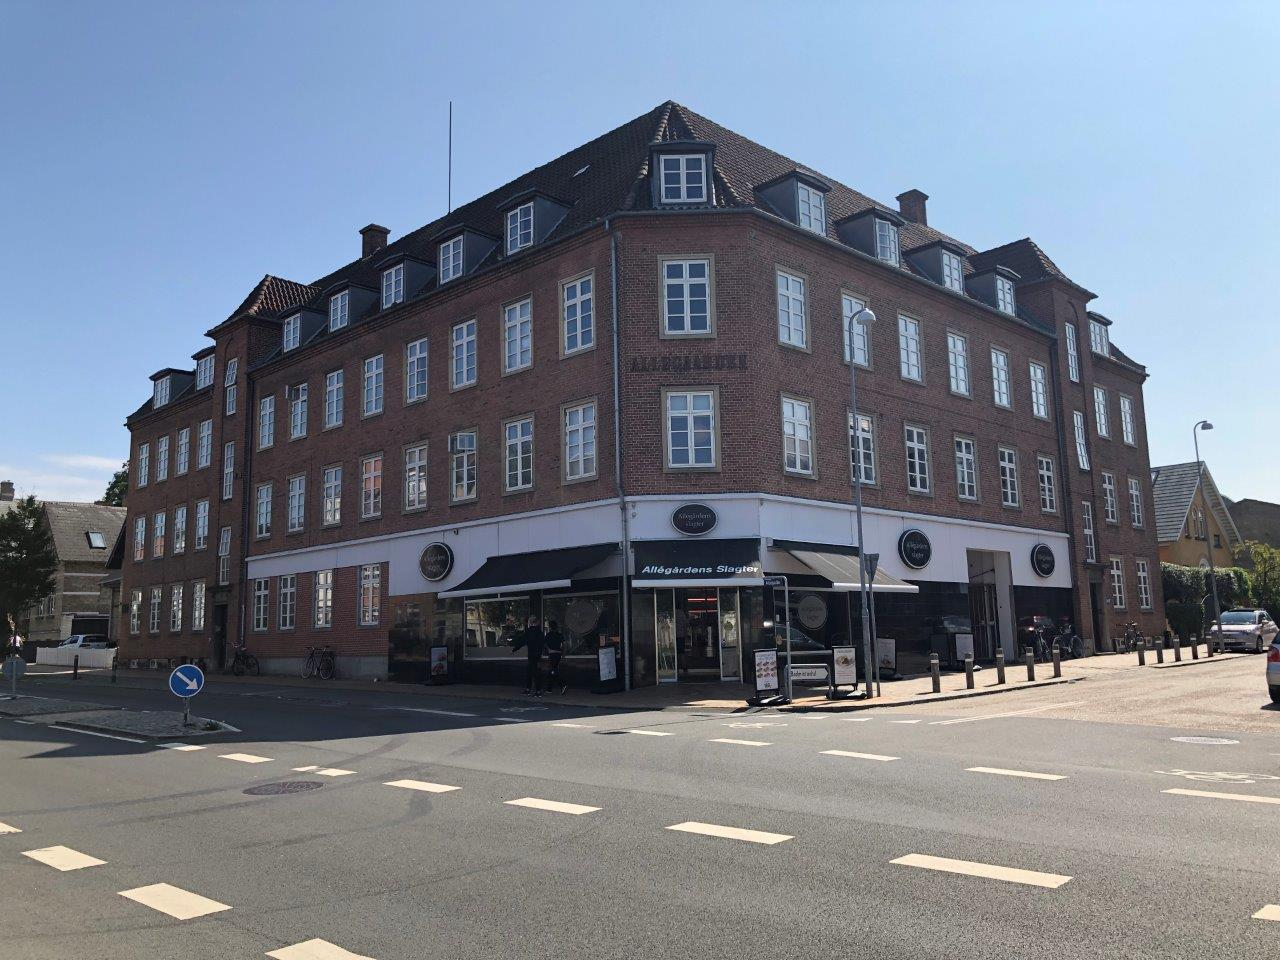 Allégade 34, 5000 Odense C